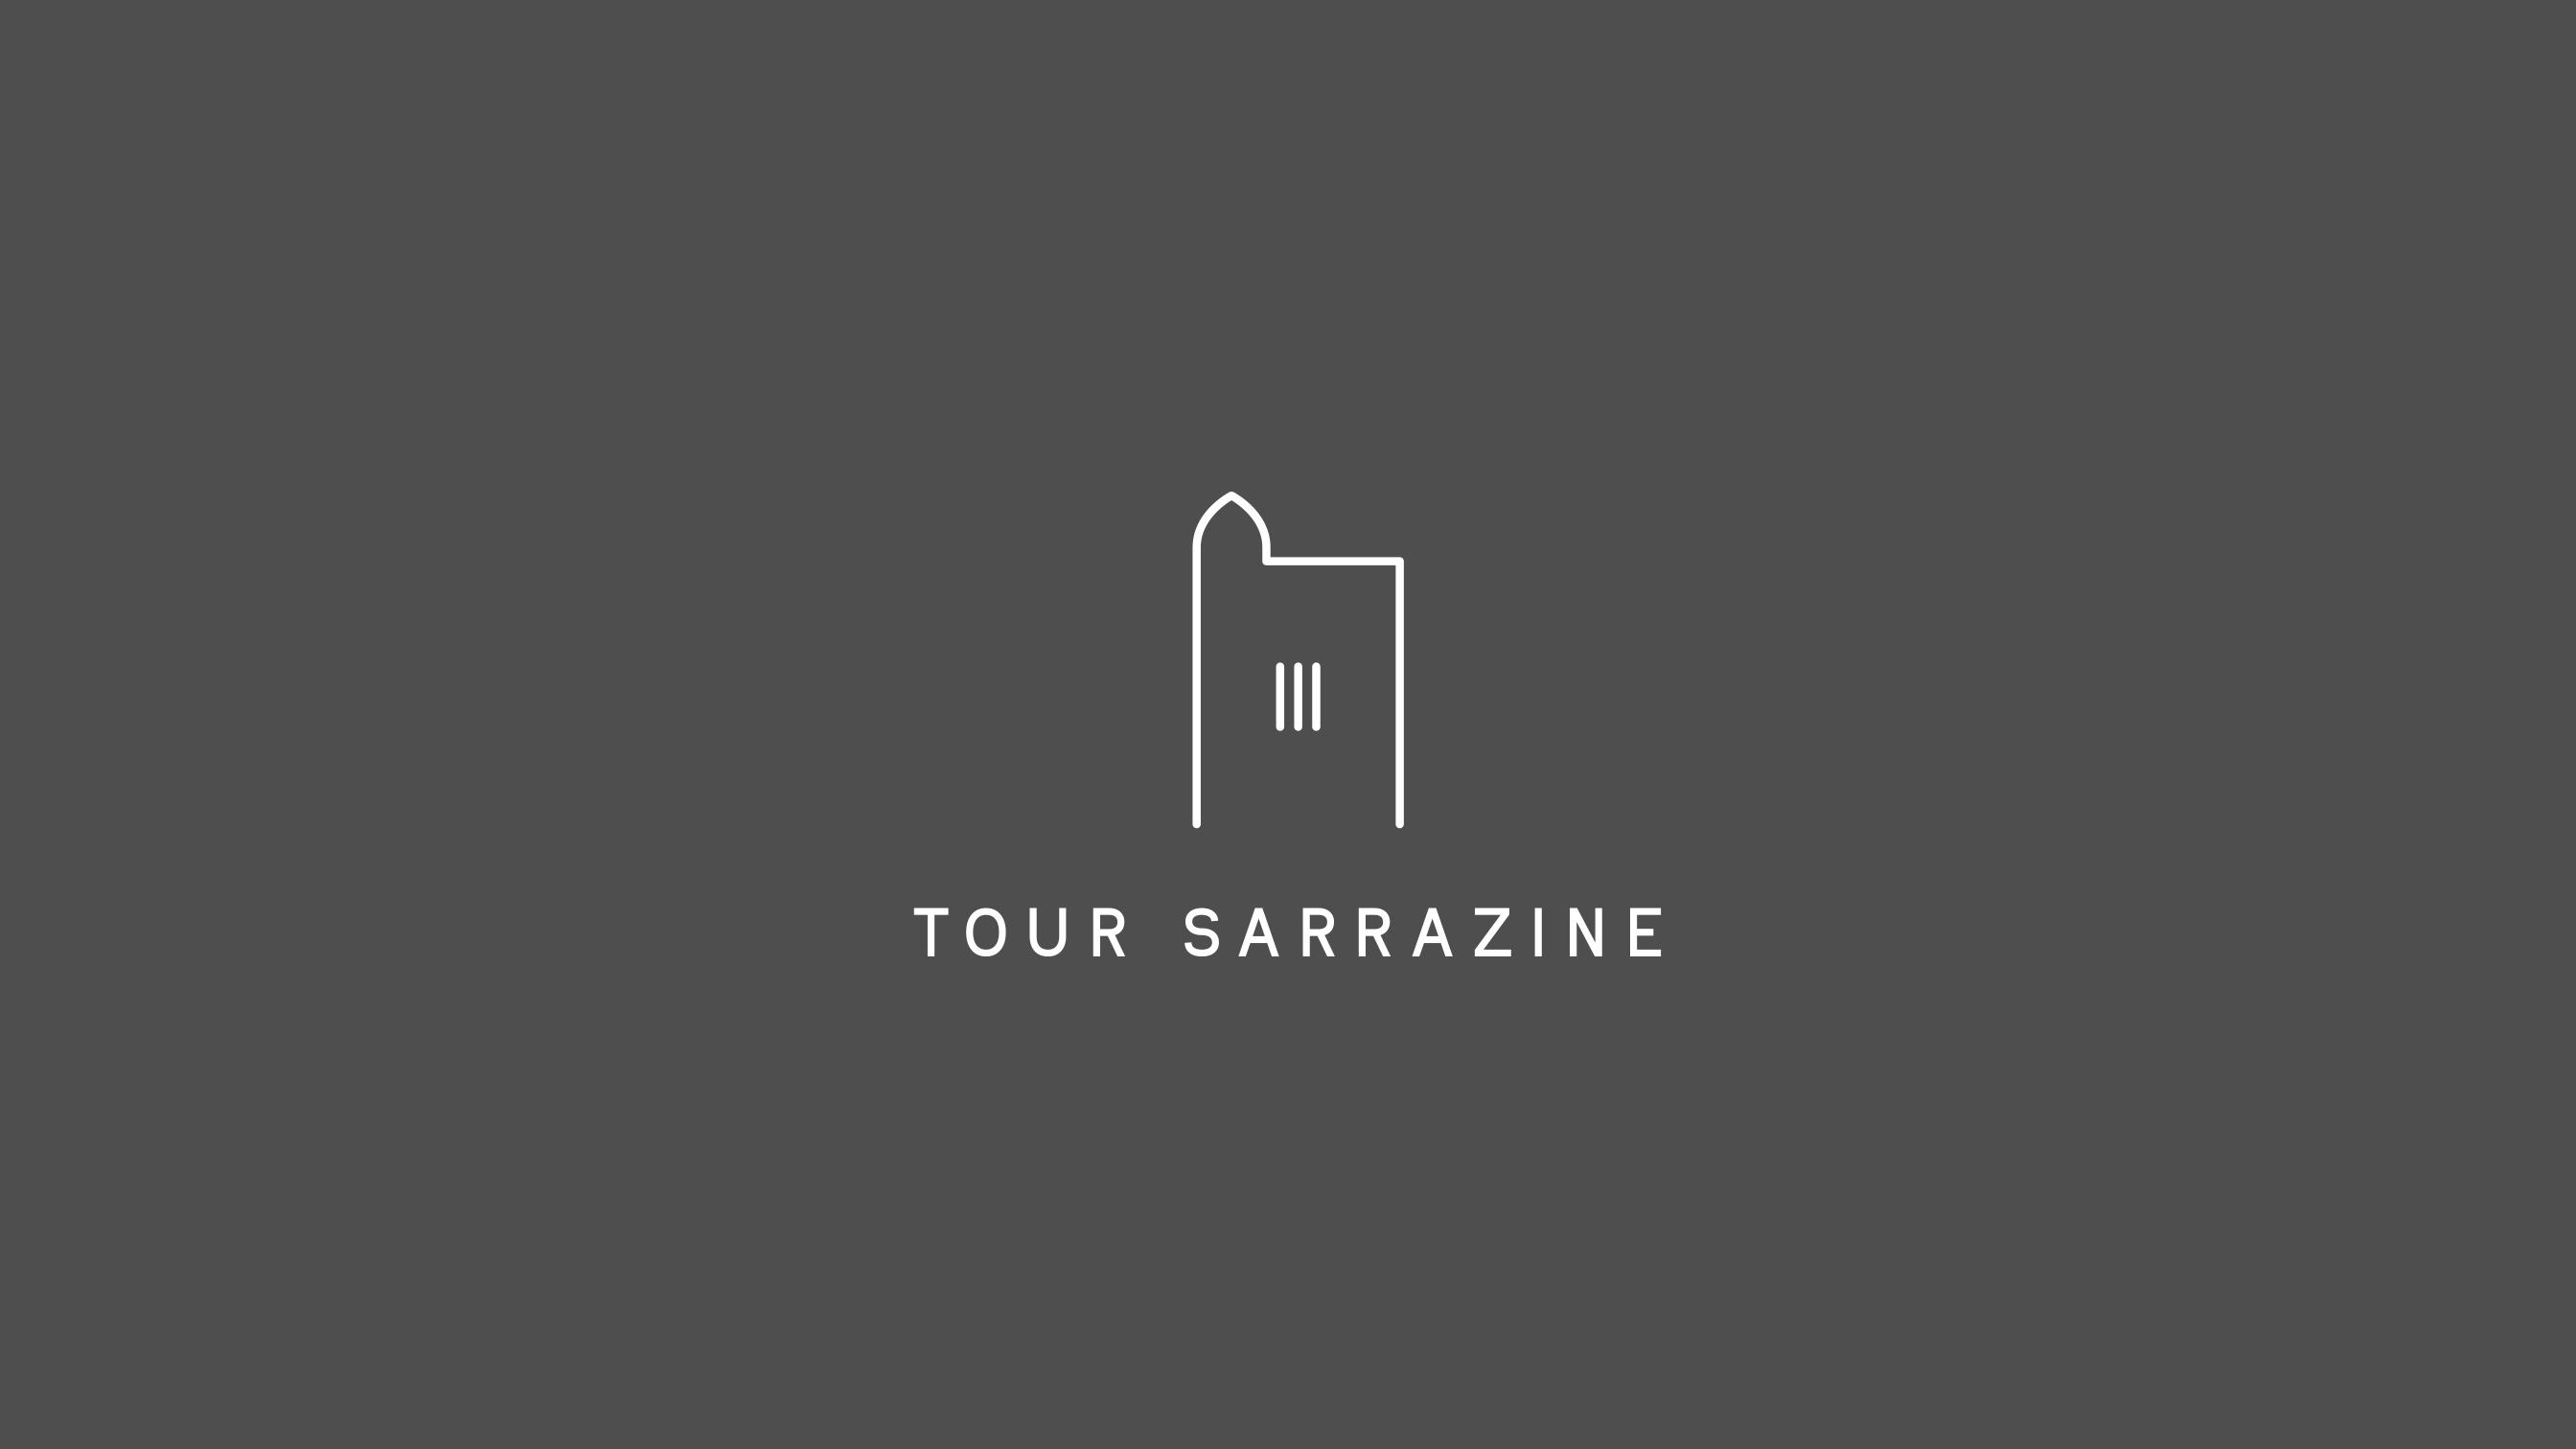 01-tour-sarrazine-pikteo-webdesign-graphic-design-freelance-paris-bruxelles-londres